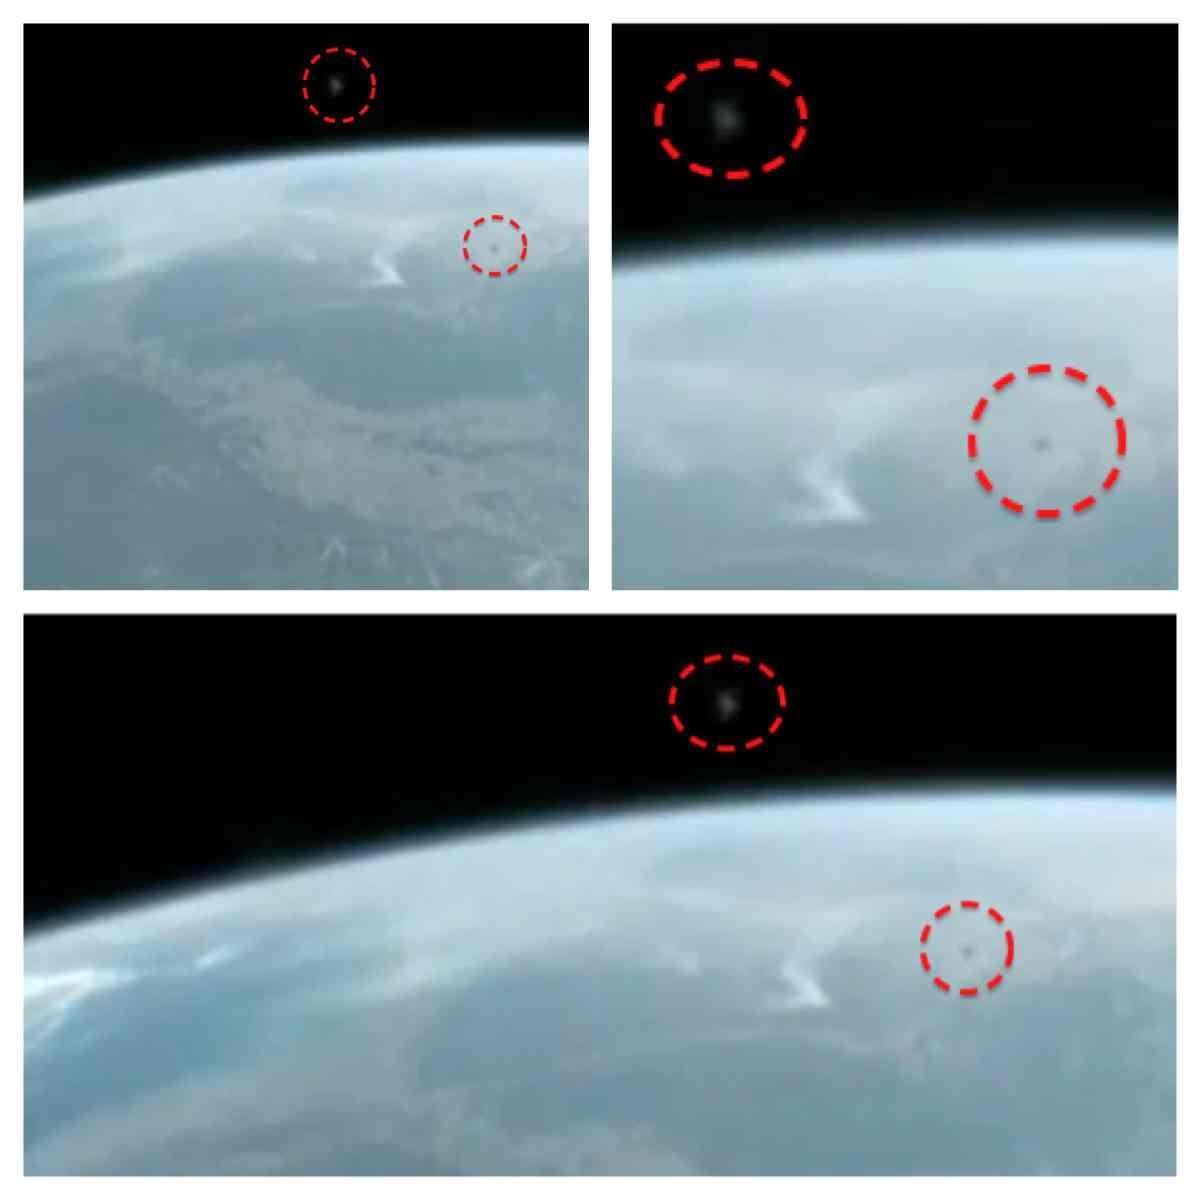 UFO SIGHTINGS DAILY: 2/1/13 - 3/1/13 Ufo 2013